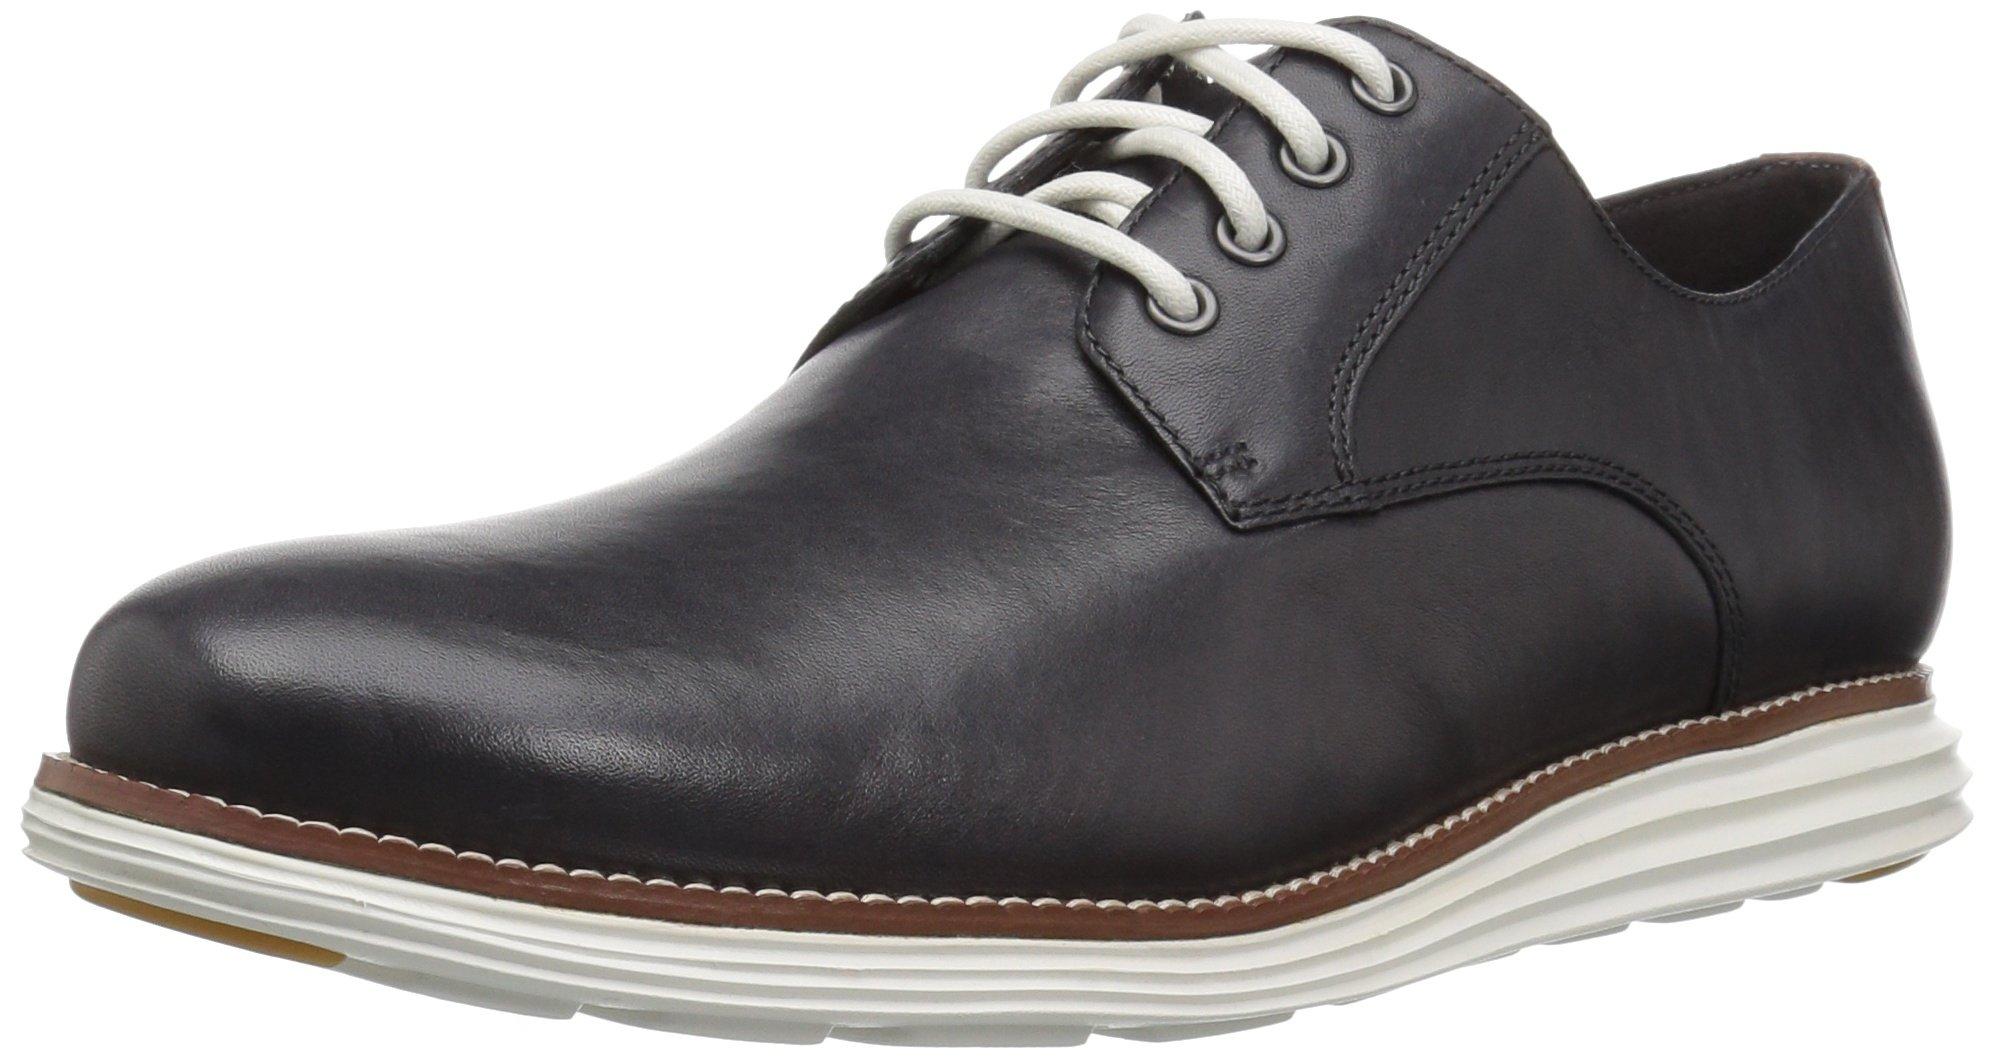 Cole Haan Men's Original Grand Plain Toe Oxford, Magnet/Woodbury/White, 10 M US